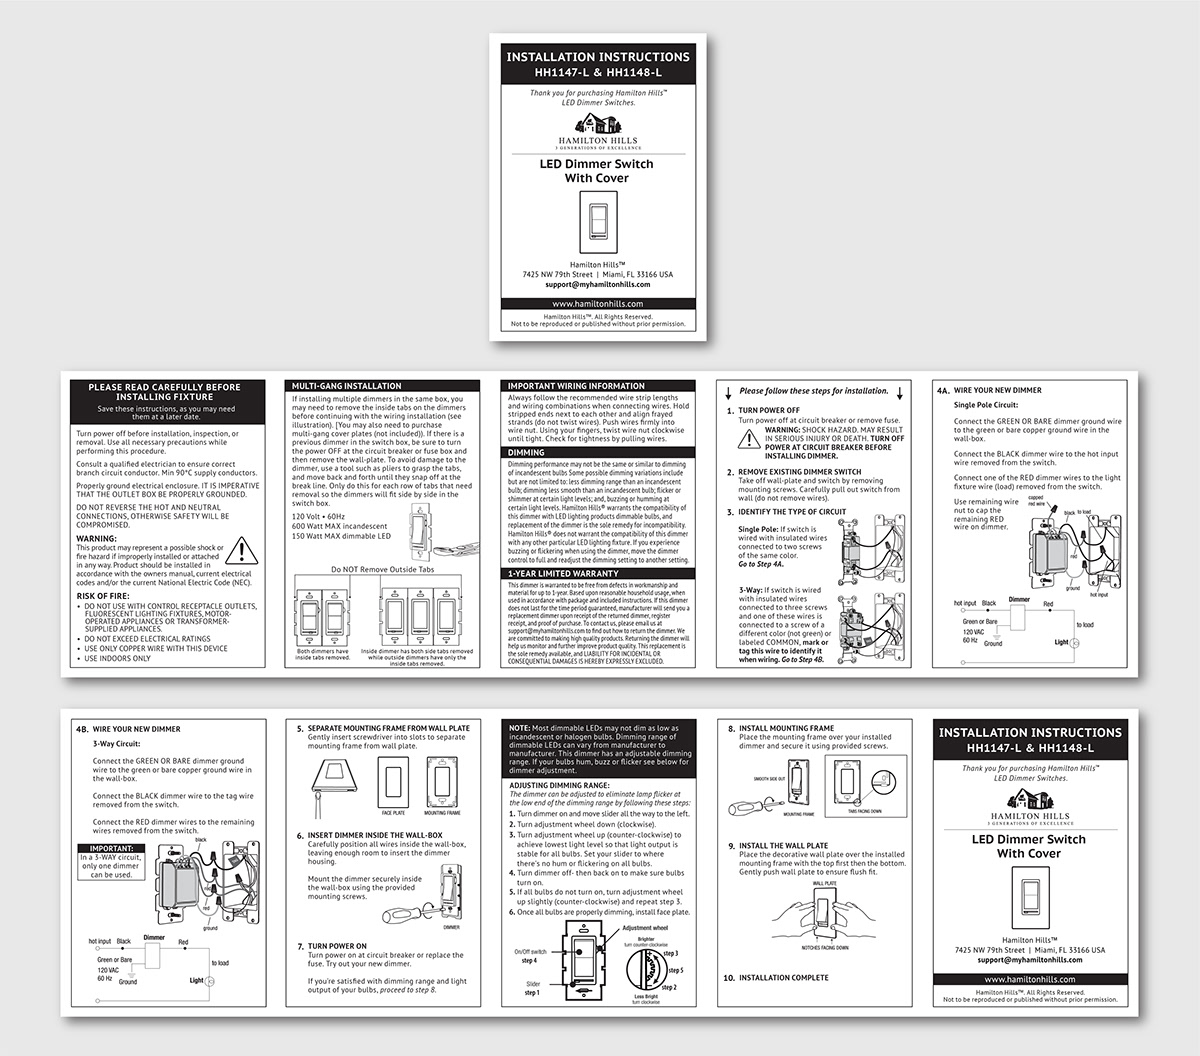 Accordion Fold Instruction Manual on Behance